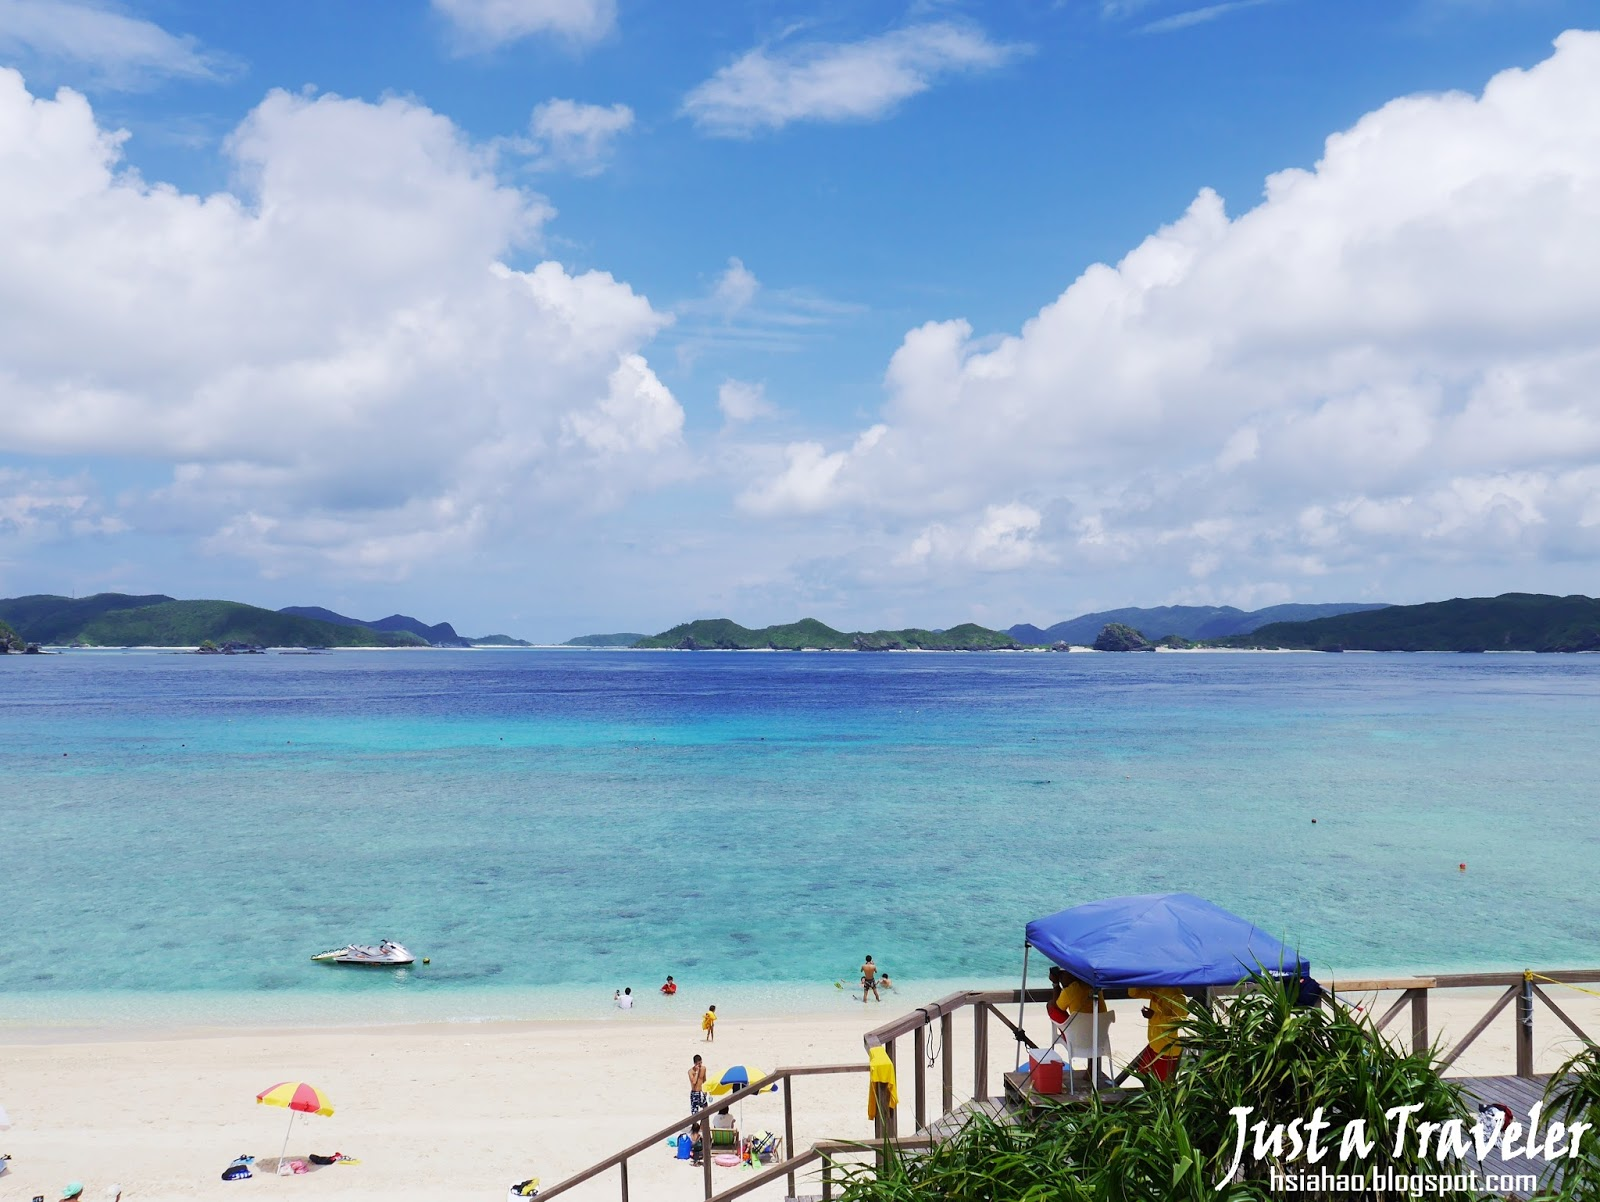 沖繩-海灘-推薦-北濱海灘-Nishibama-Beach-北浜ビーチ-Okinawa-beach-recommendation